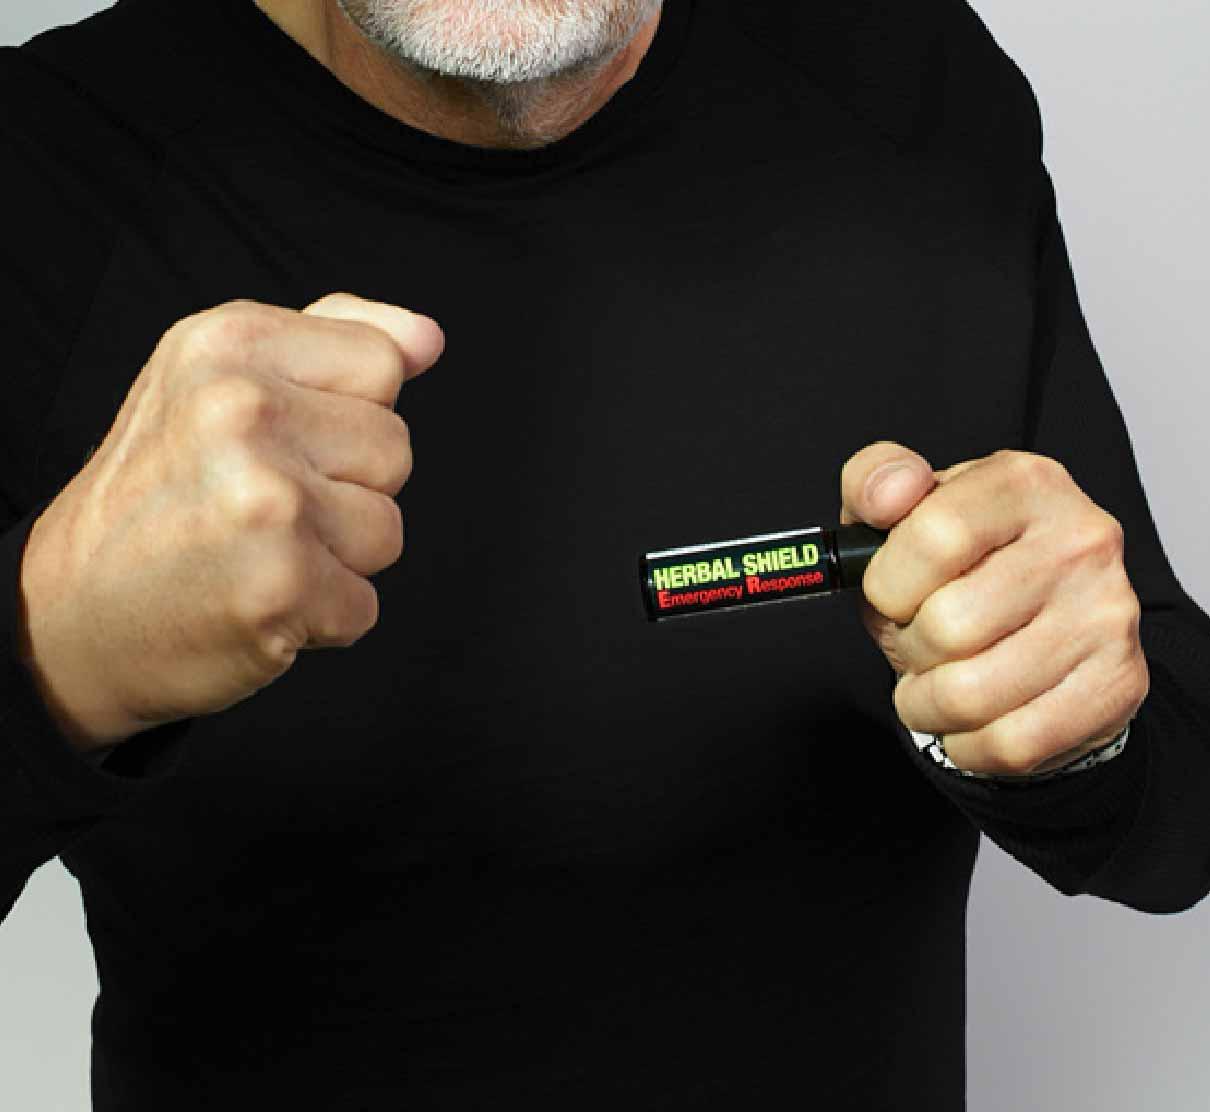 Dr. Richard Schulze - For Immune Support